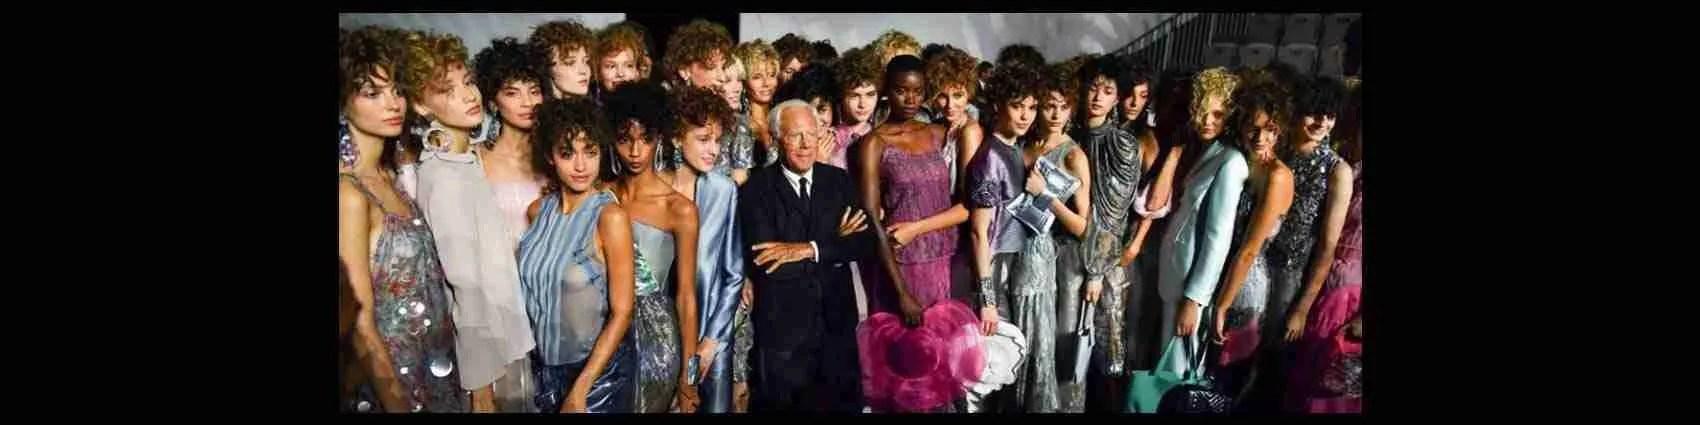 Escort Lombardia alle fashion week milanesi. Magica Escort